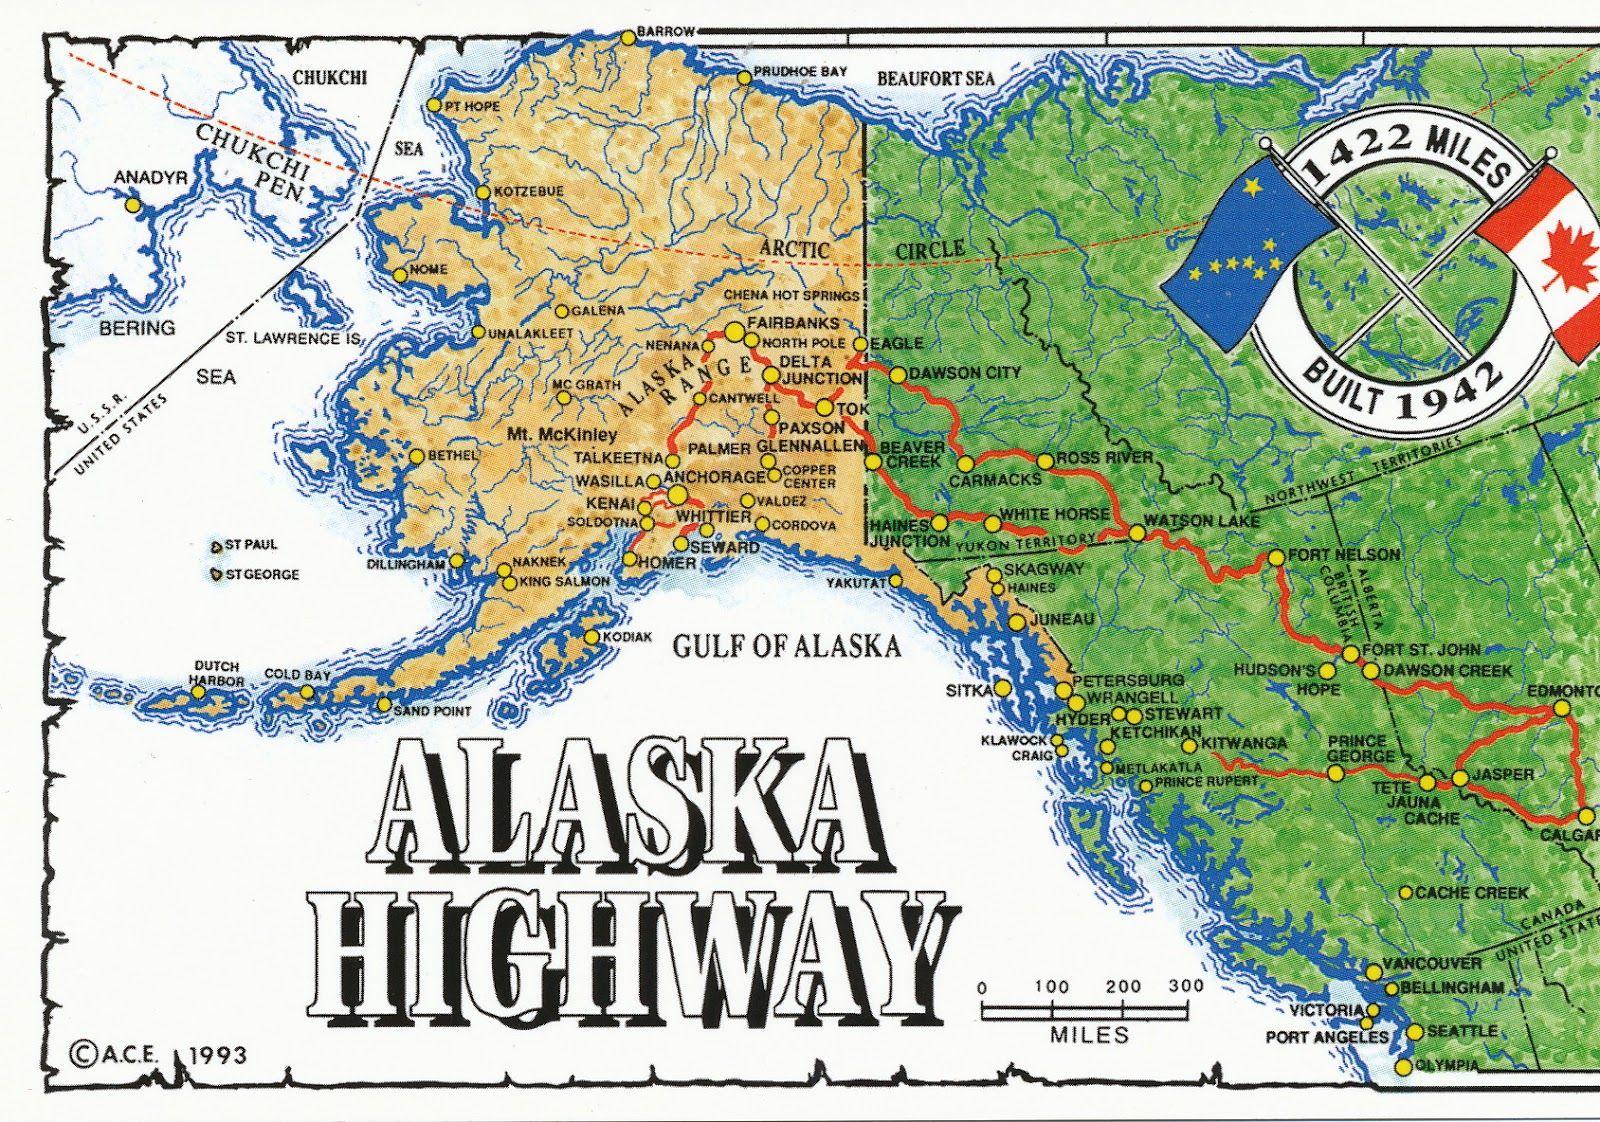 Alcan Highway Map Alaska | Online Maps: Alaska Highway Map | Alaska travel | Alaska